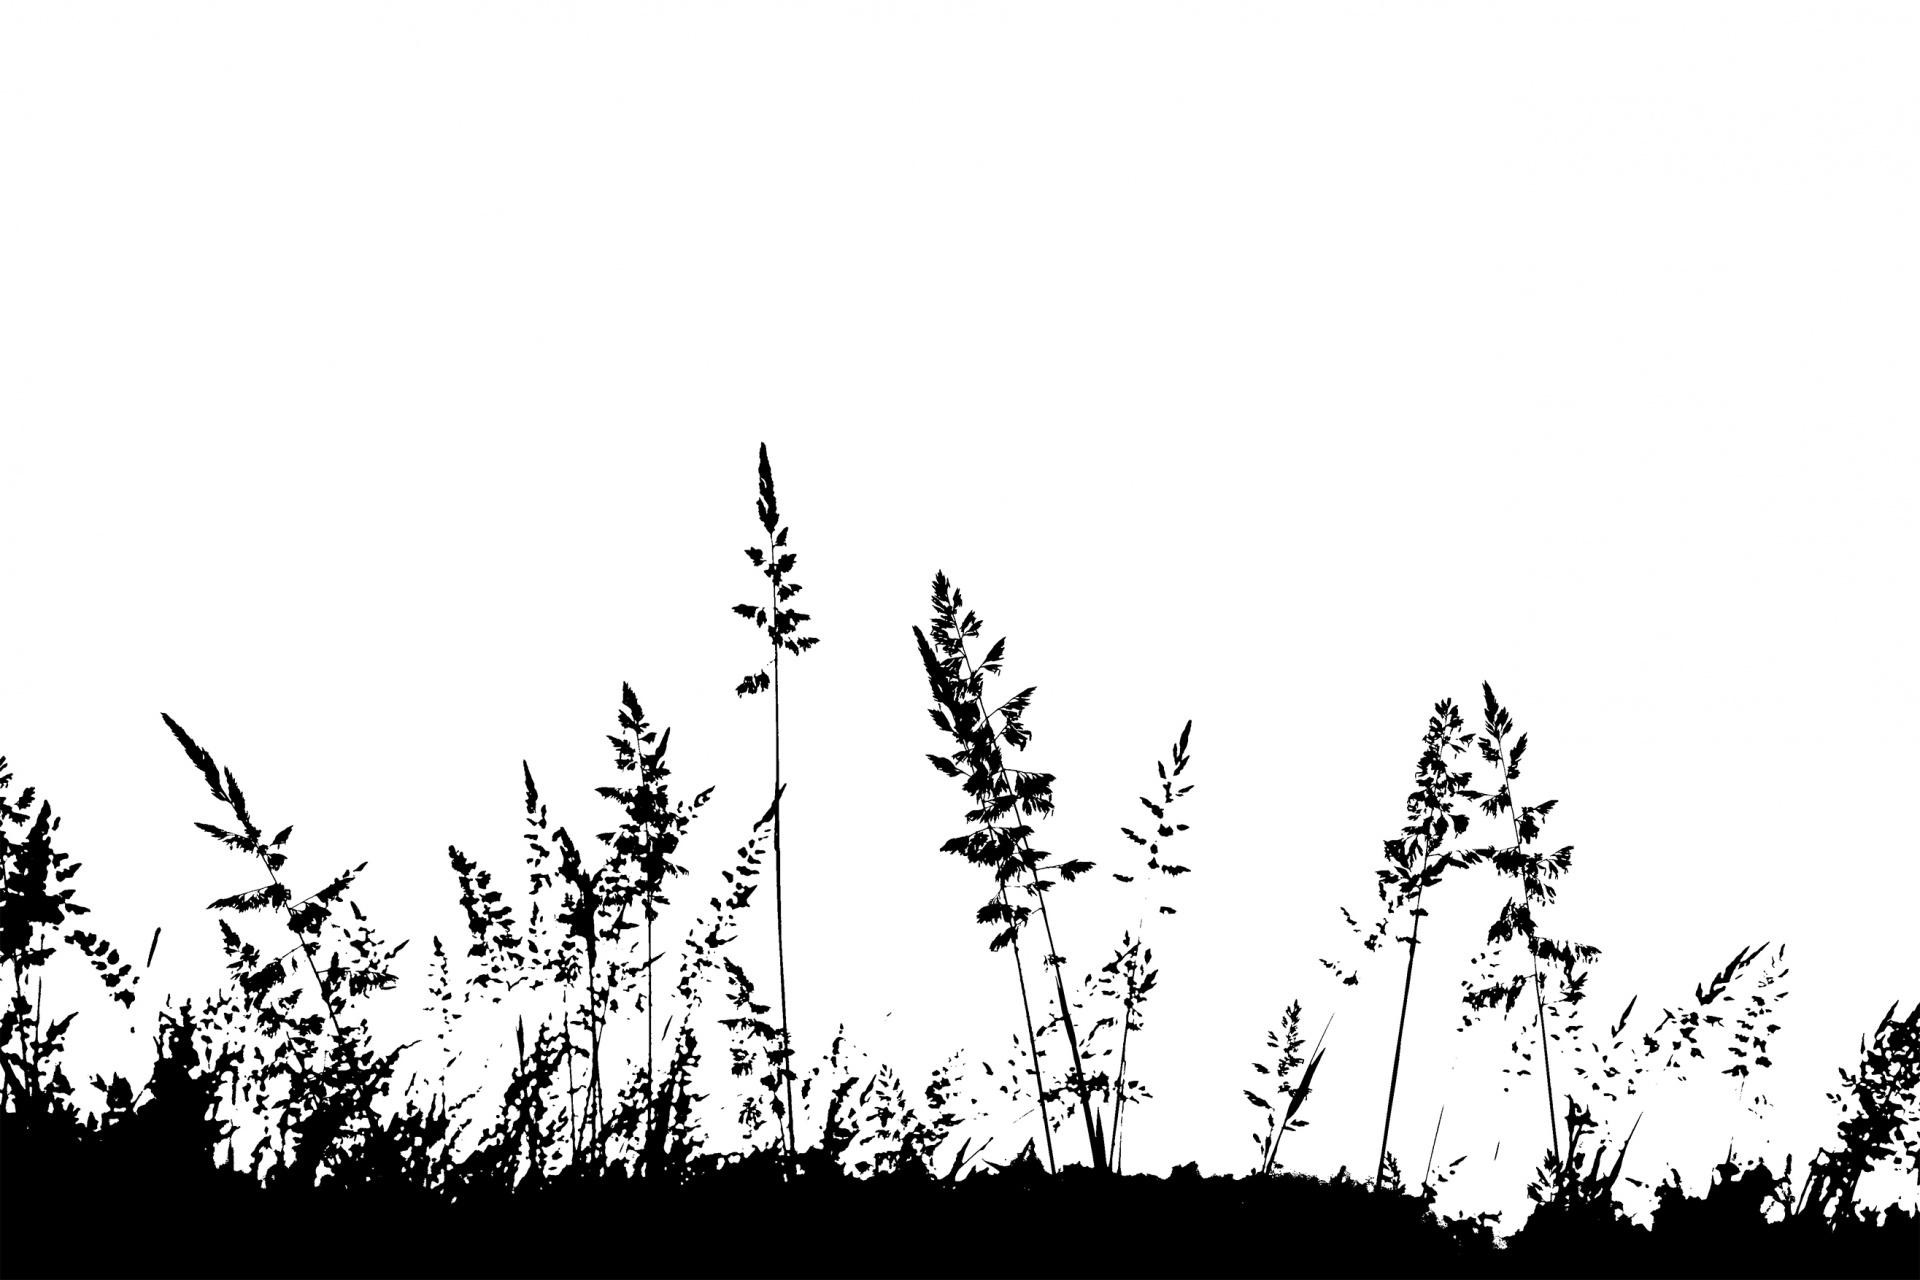 Grass Silhouette Free Stock Photo